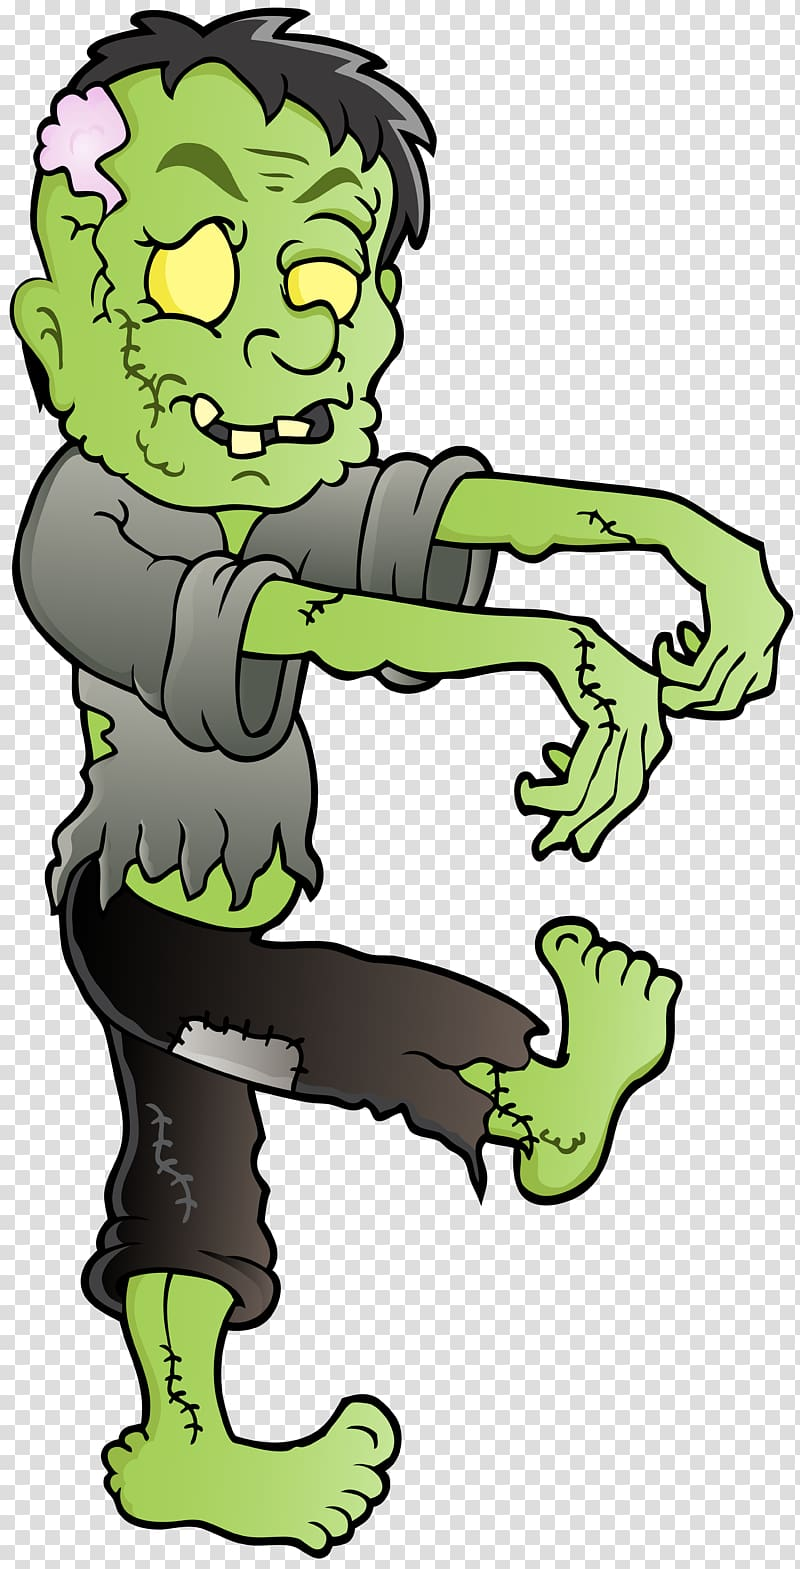 Zombie transparent background PNG clipart.